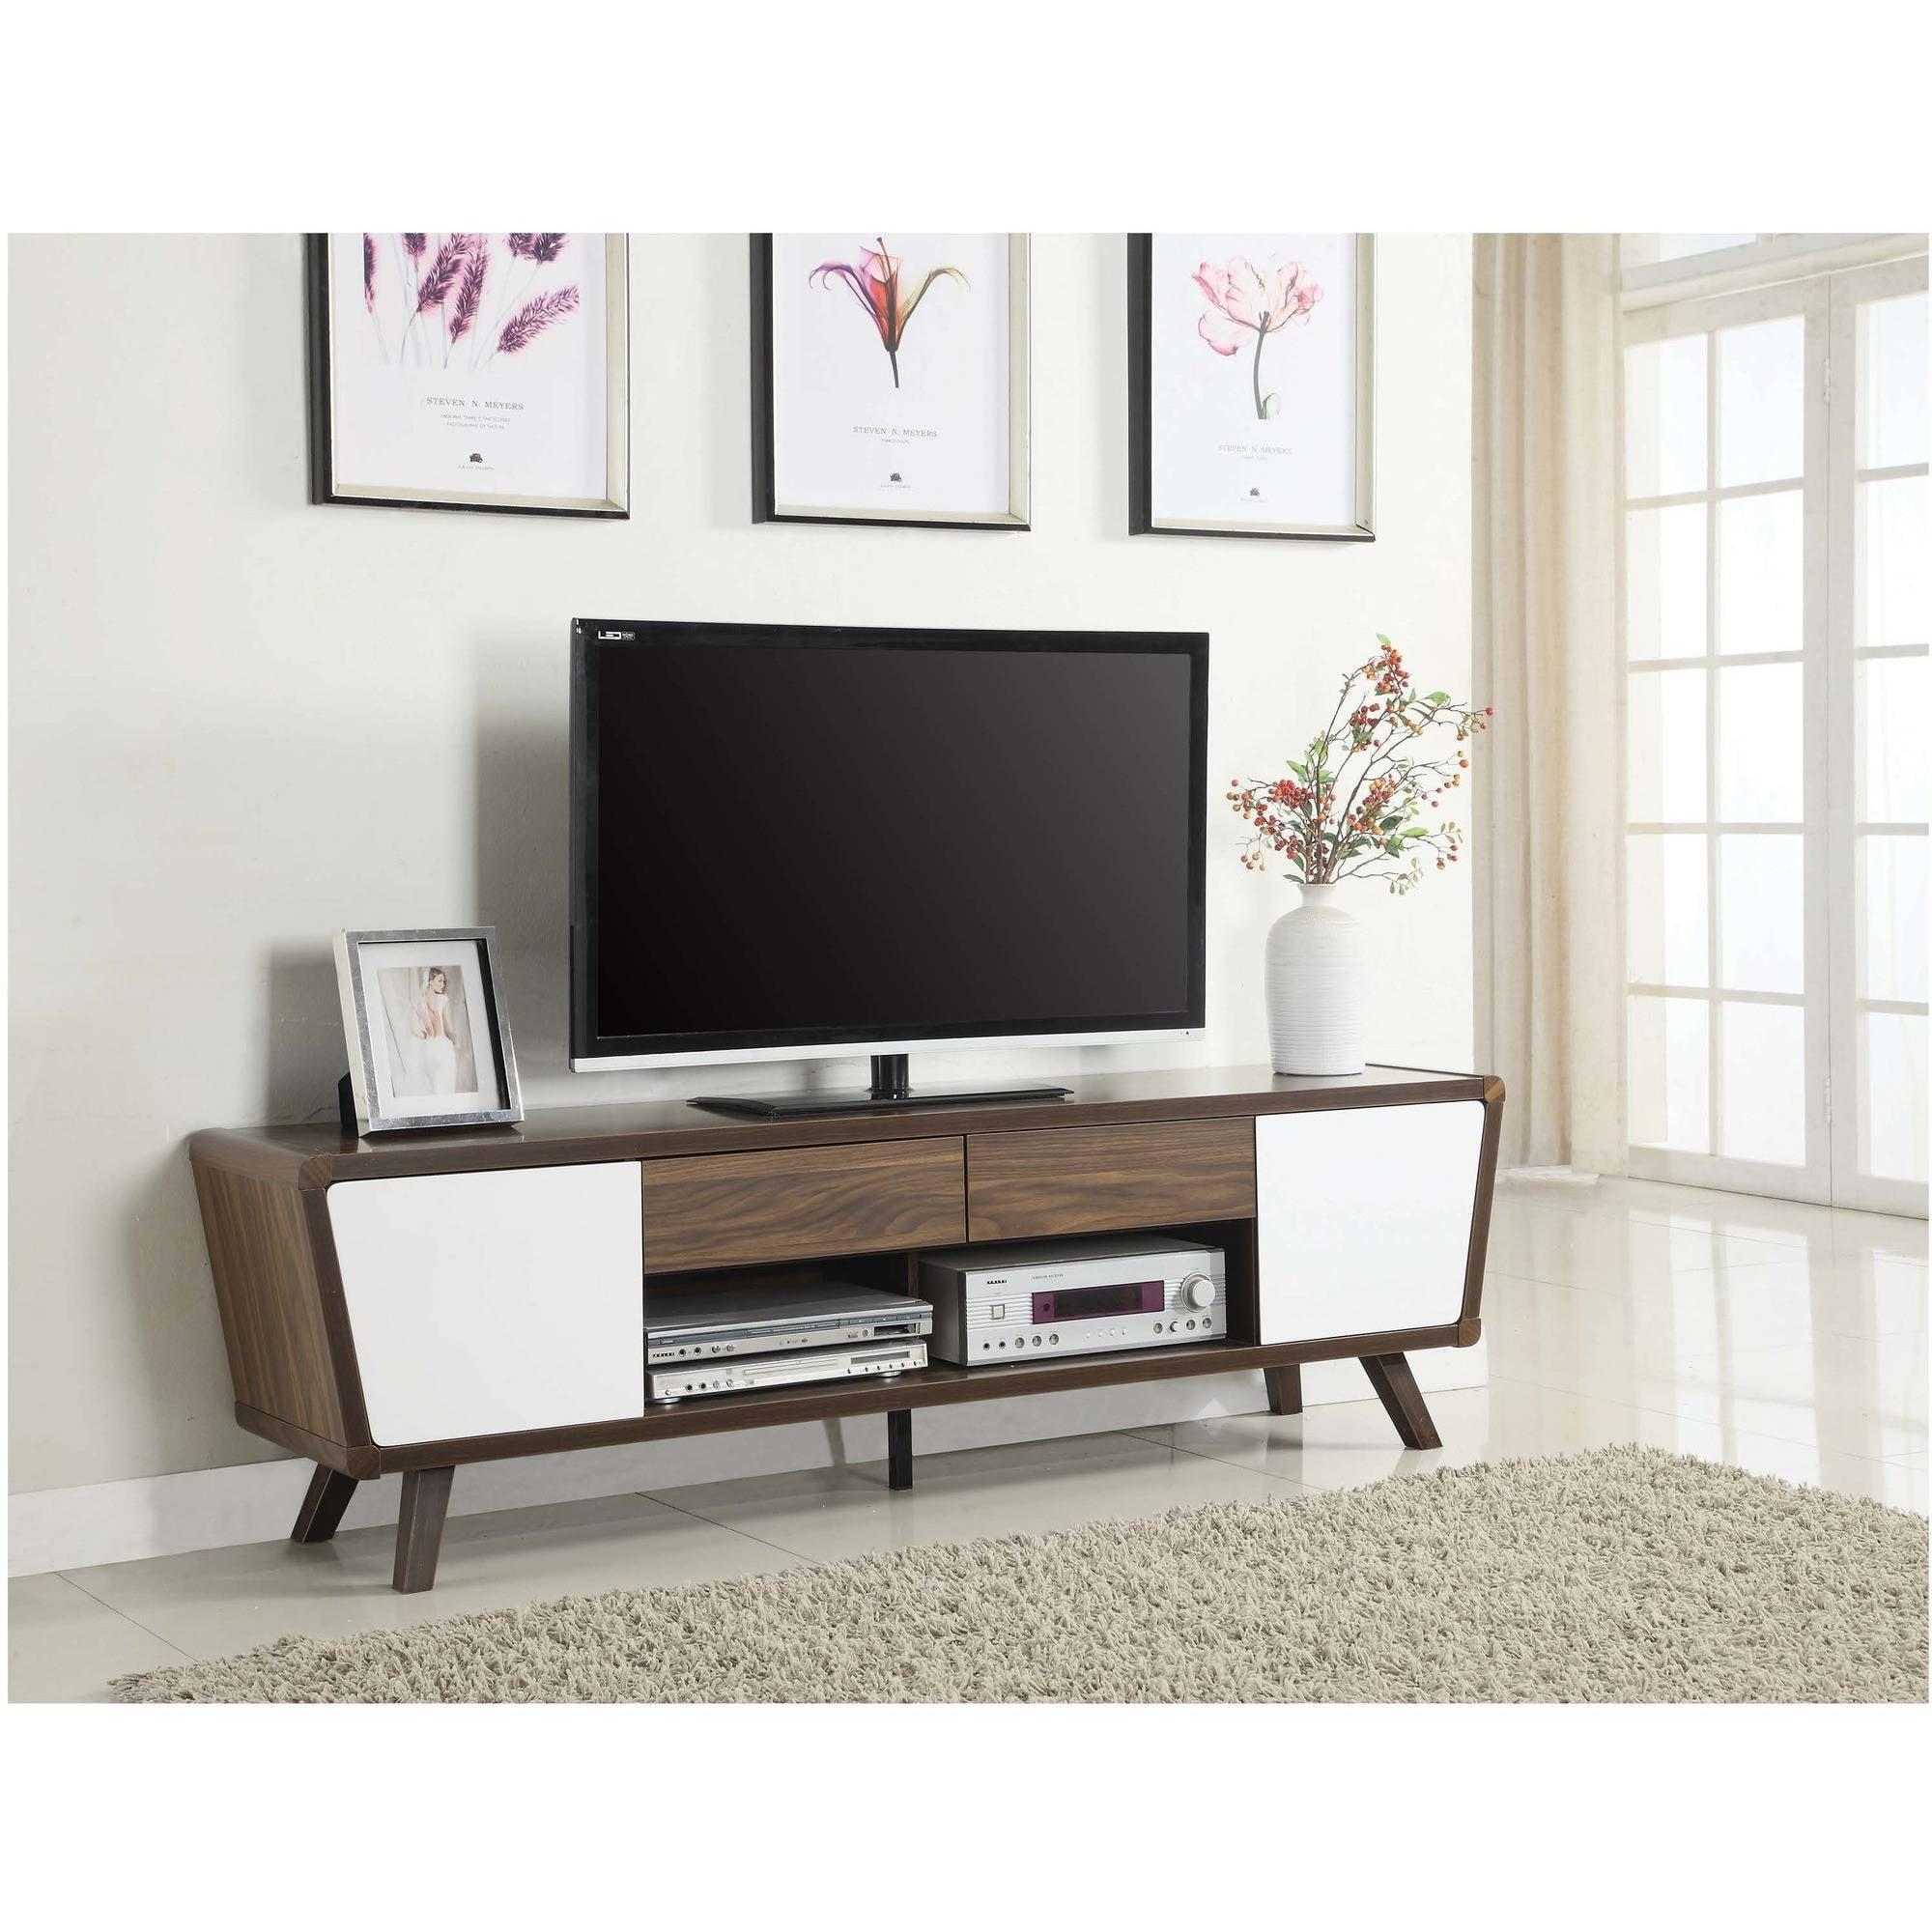 "Modern Mid Century 75"" TV Media Console Stand Cabinet Retro Wood"